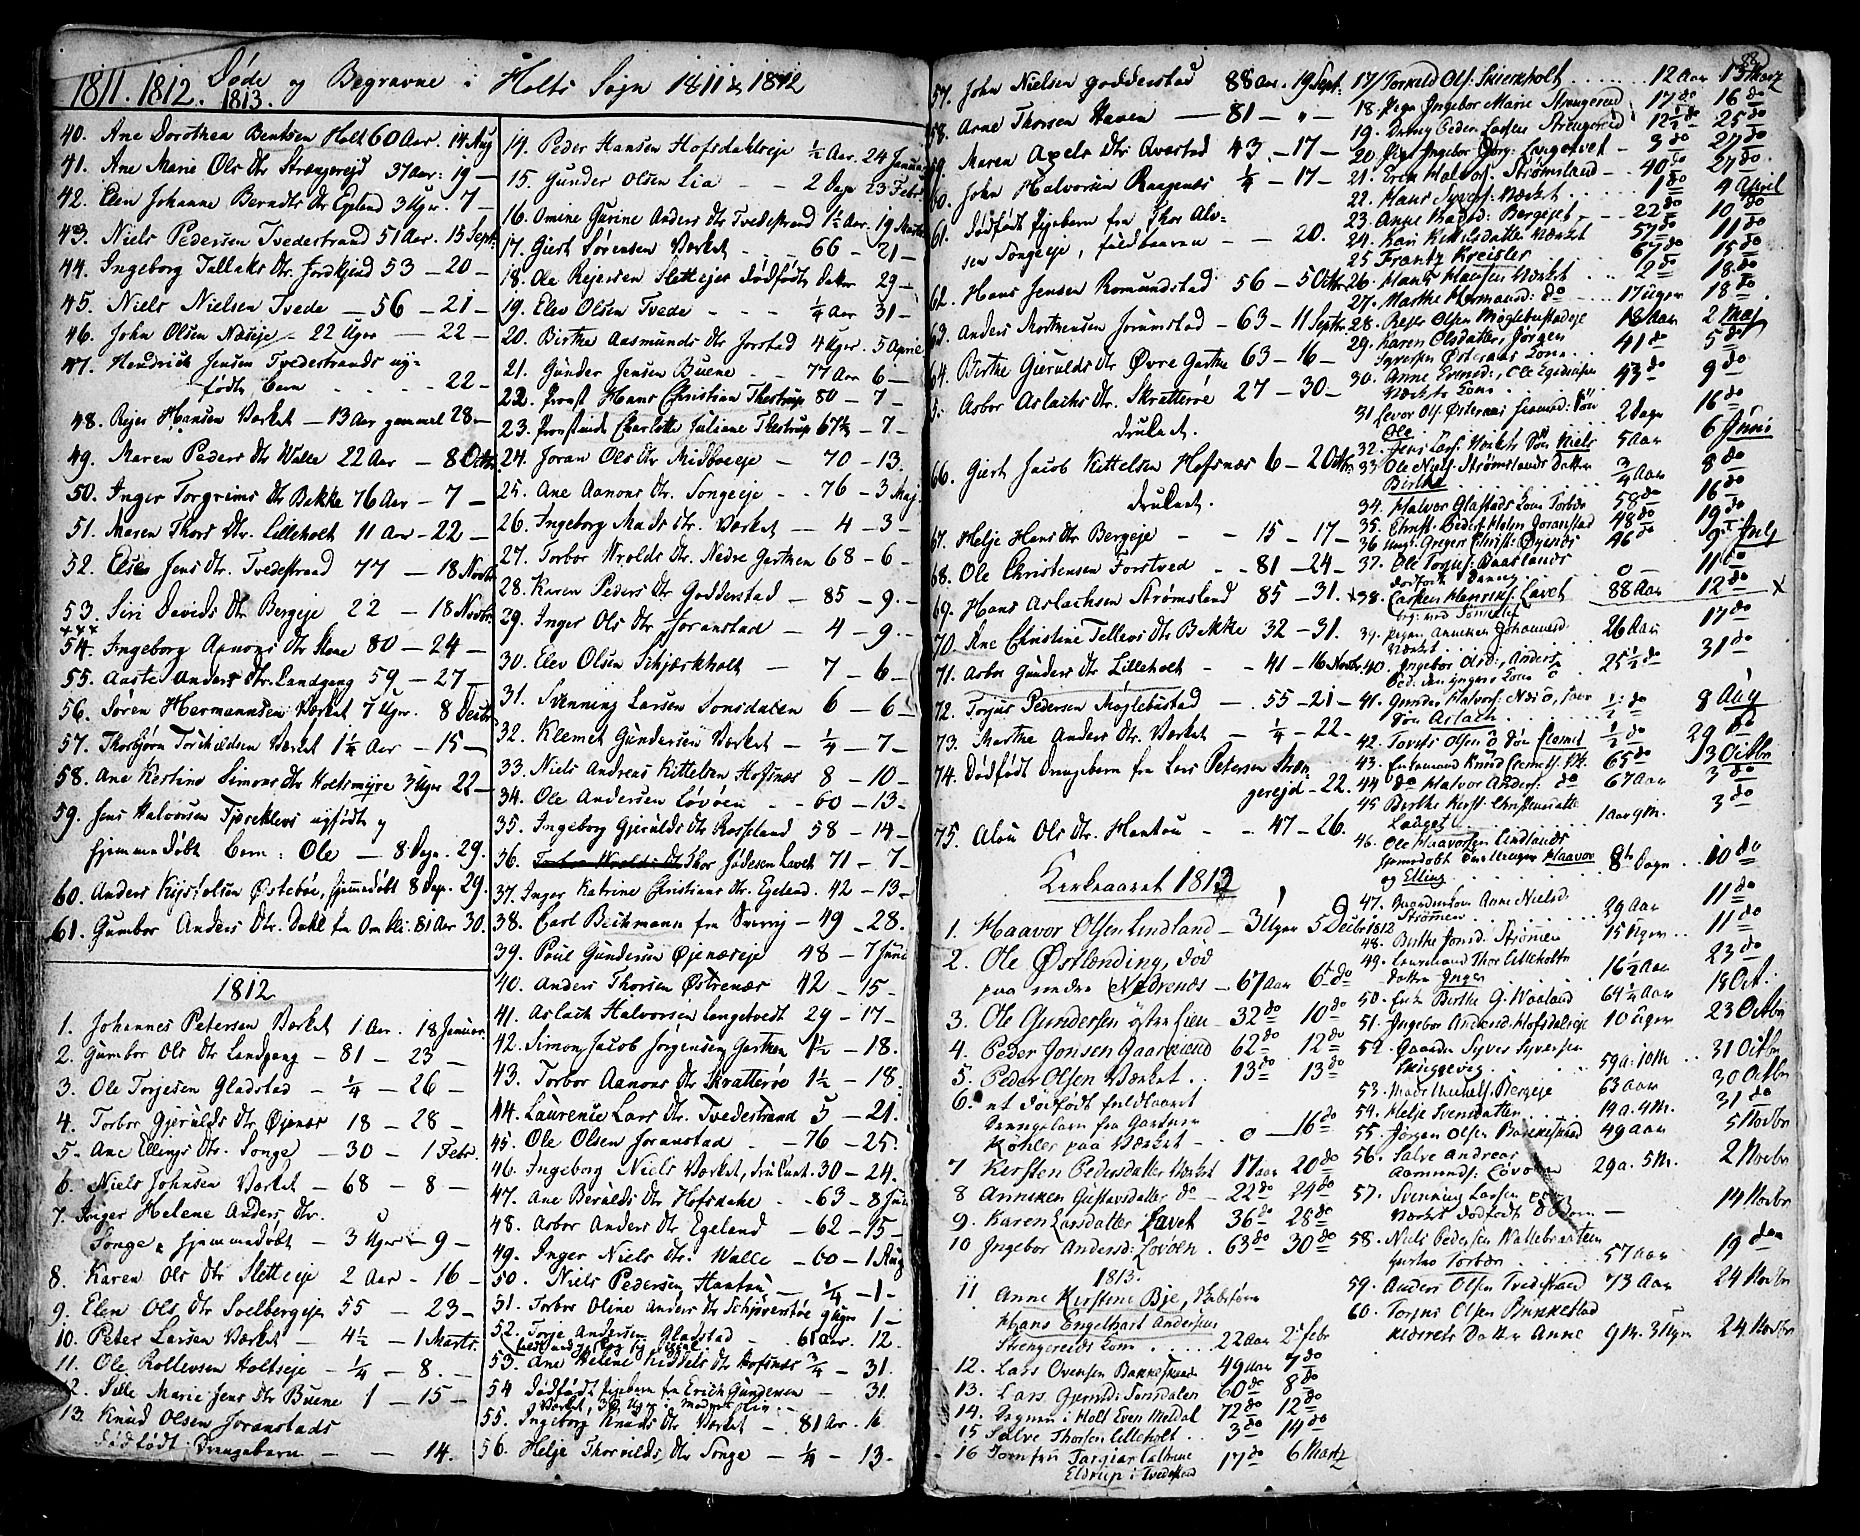 SAK, Holt sokneprestkontor, F/Fa/L0004: Ministerialbok nr. A 4, 1799-1813, s. 88